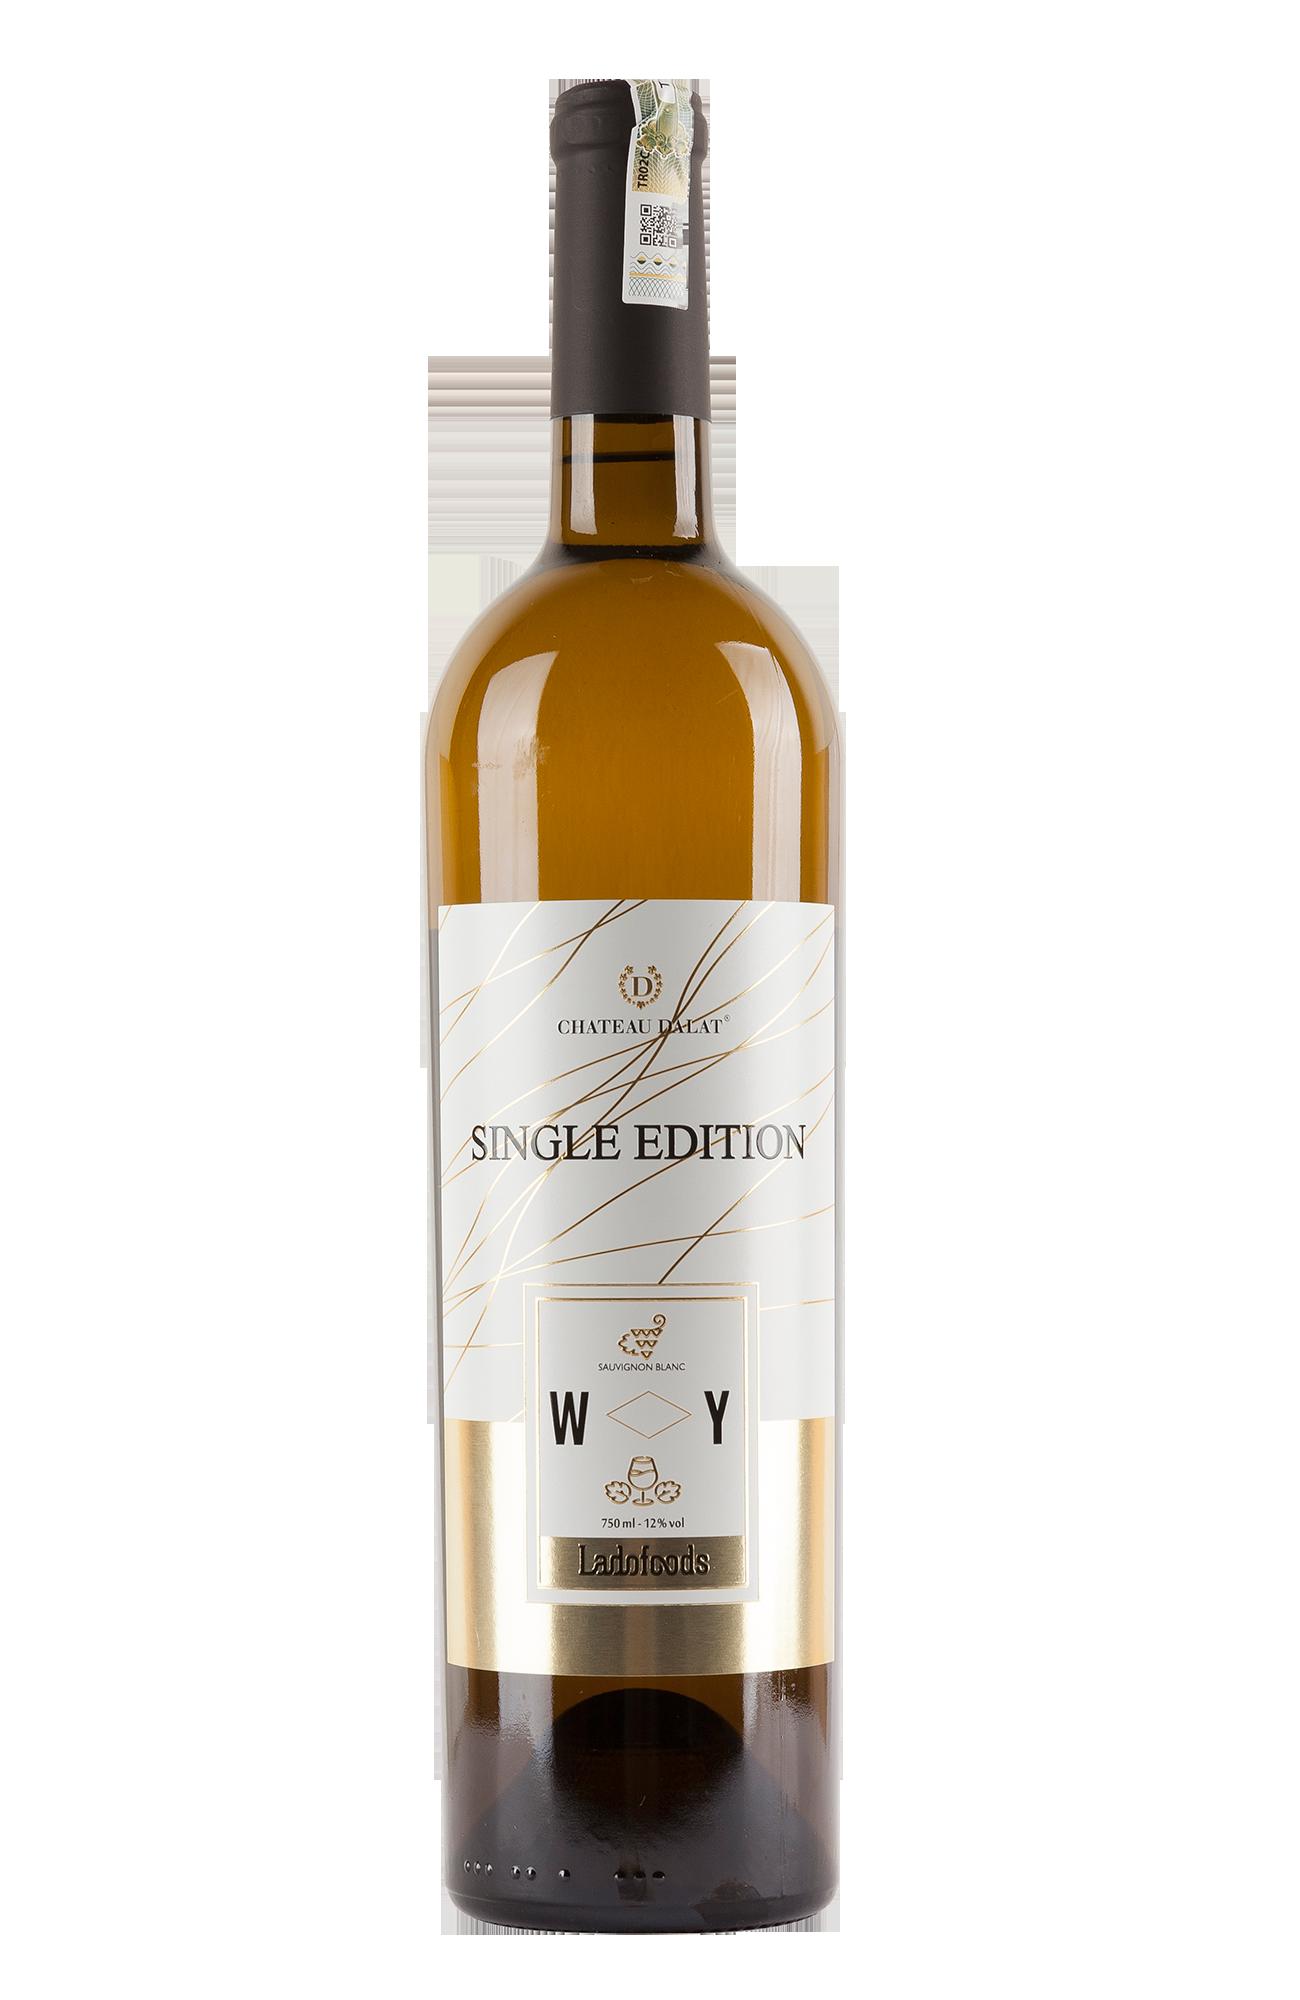 Chateau DaLat Single Edition Sauvignon Blanc